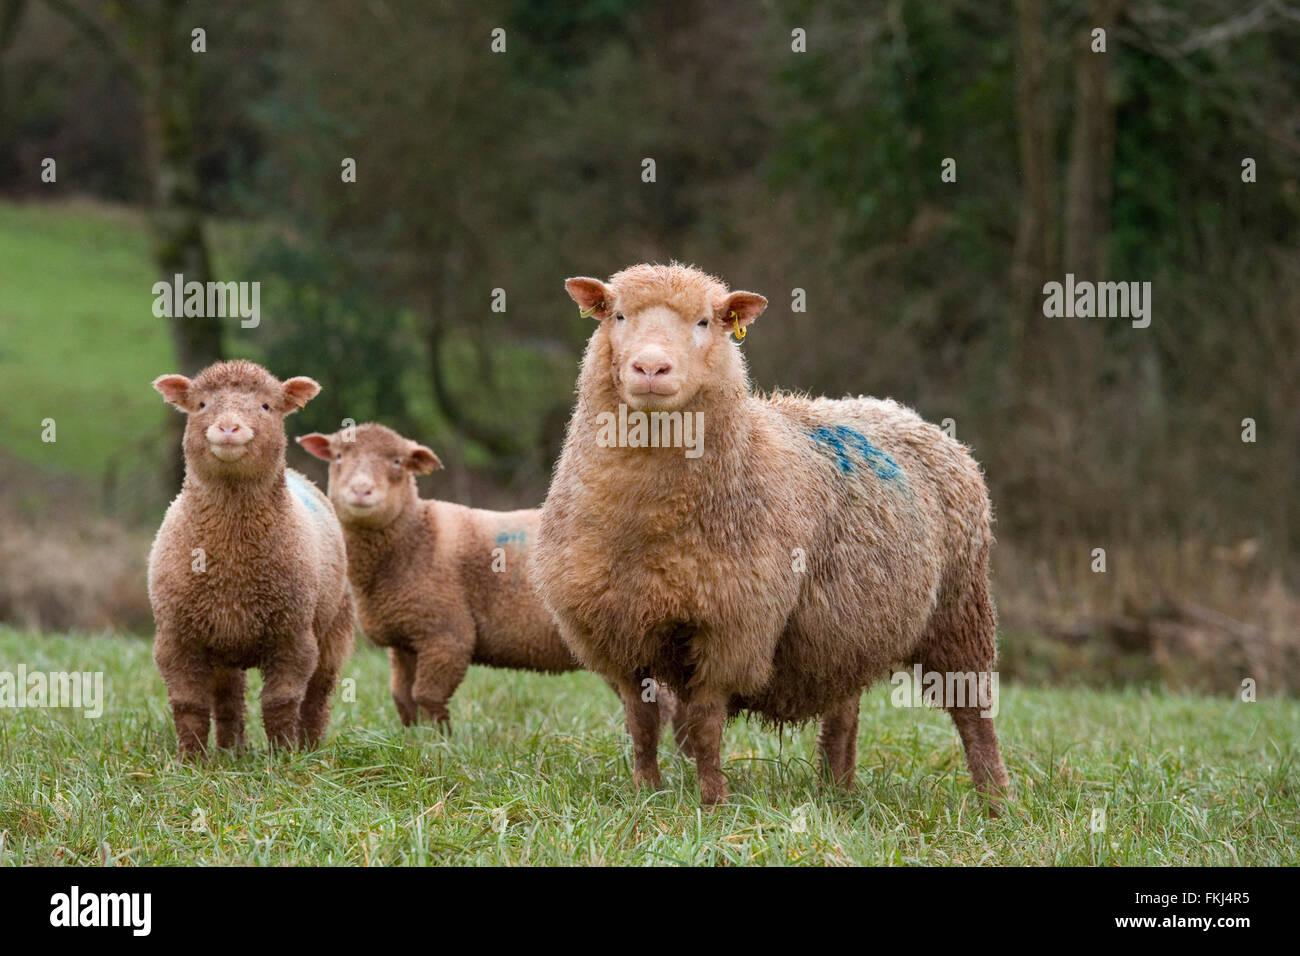 ewe and her two lambs - Stock Image